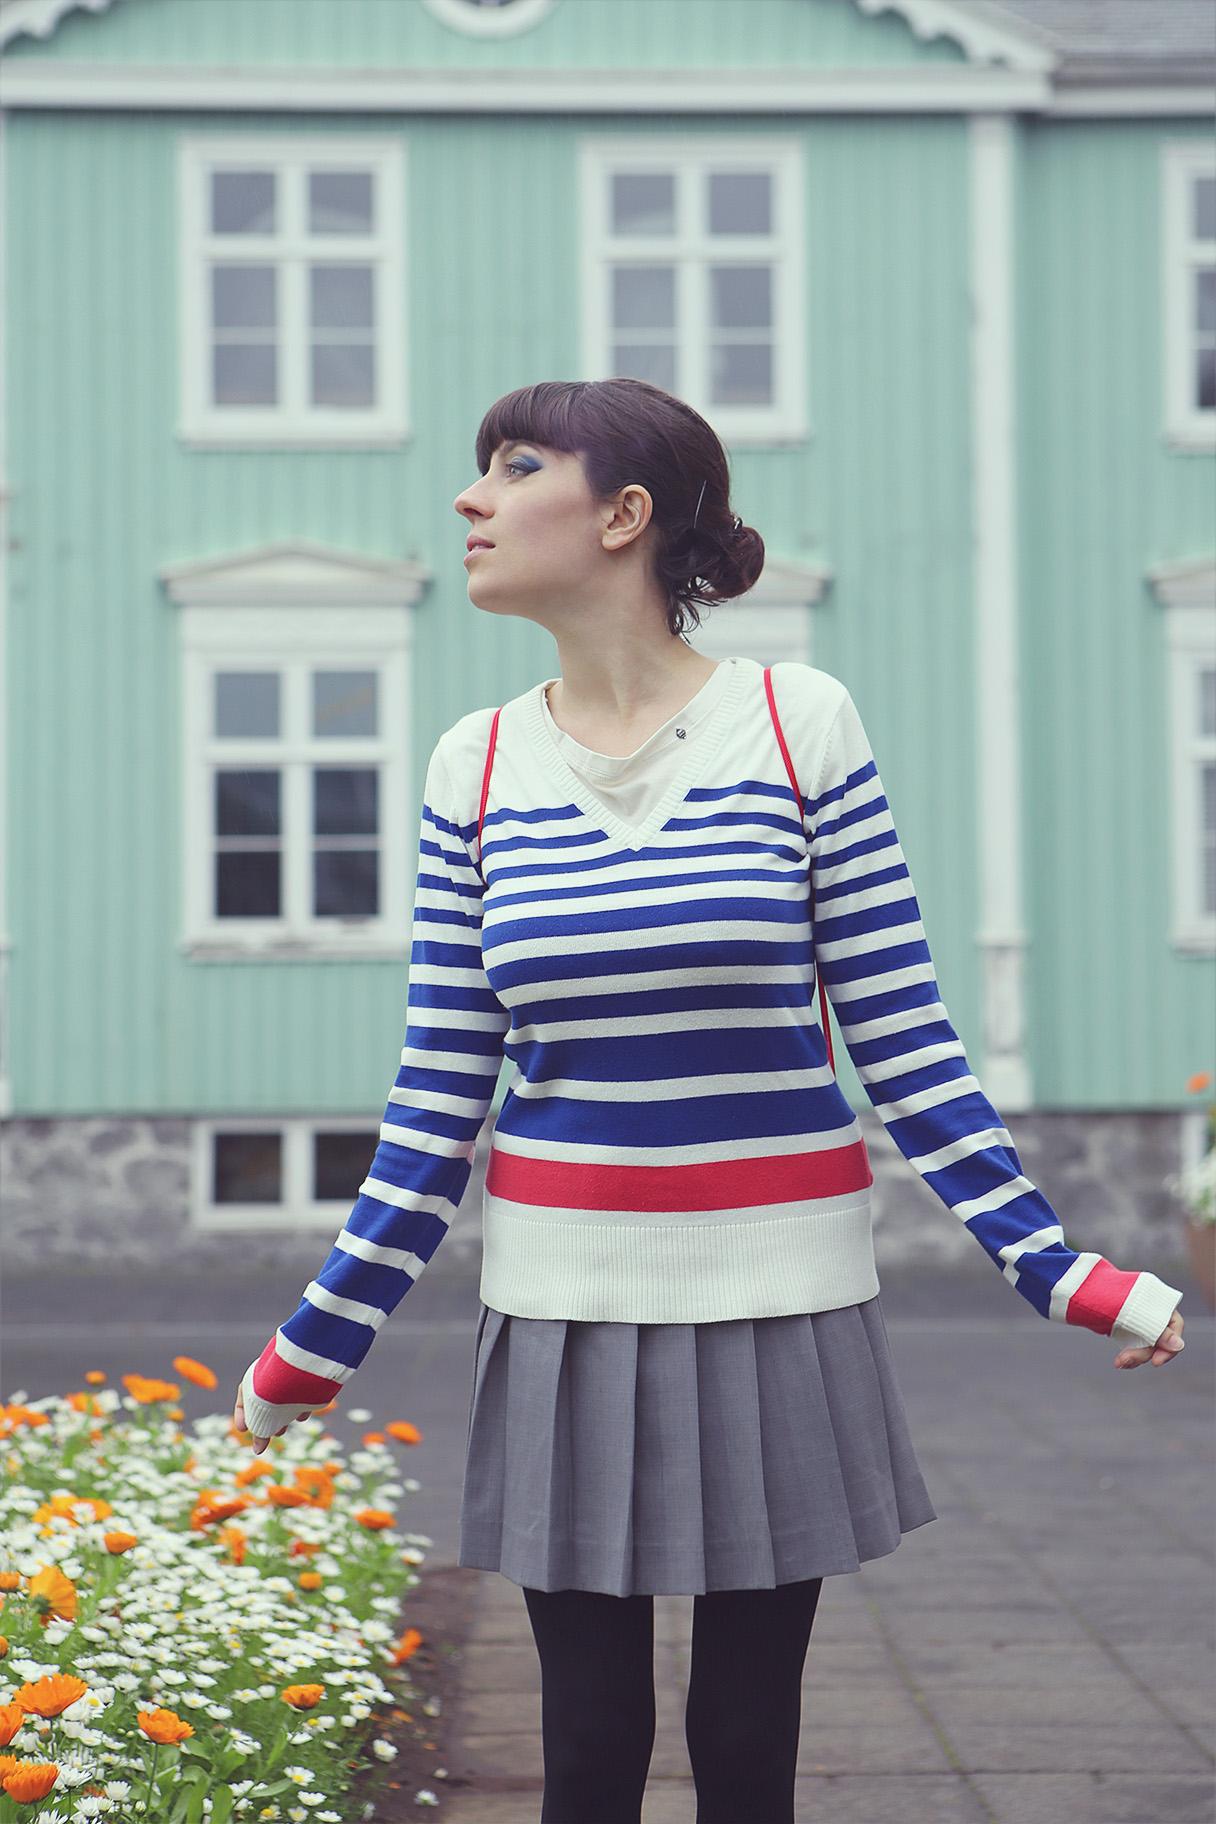 Walking in Reykjavik - 09